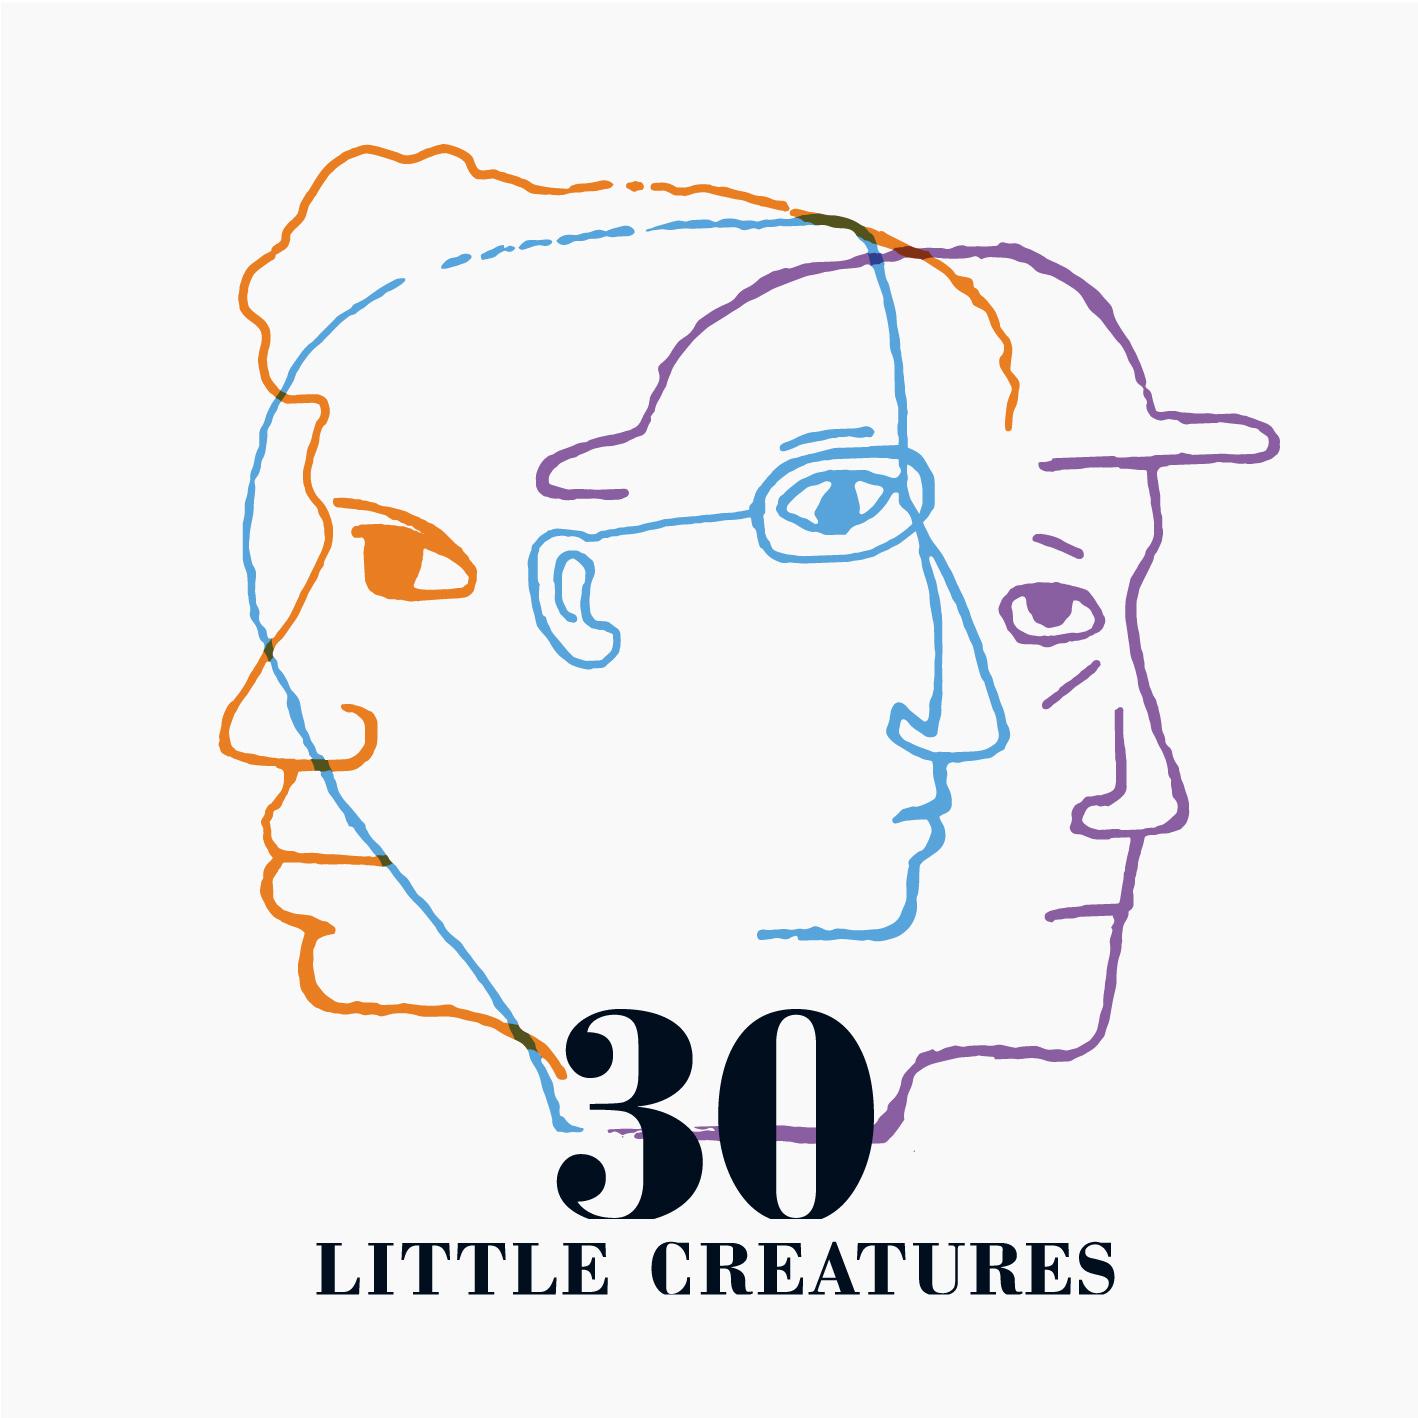 LITTLE CREATURES『30』